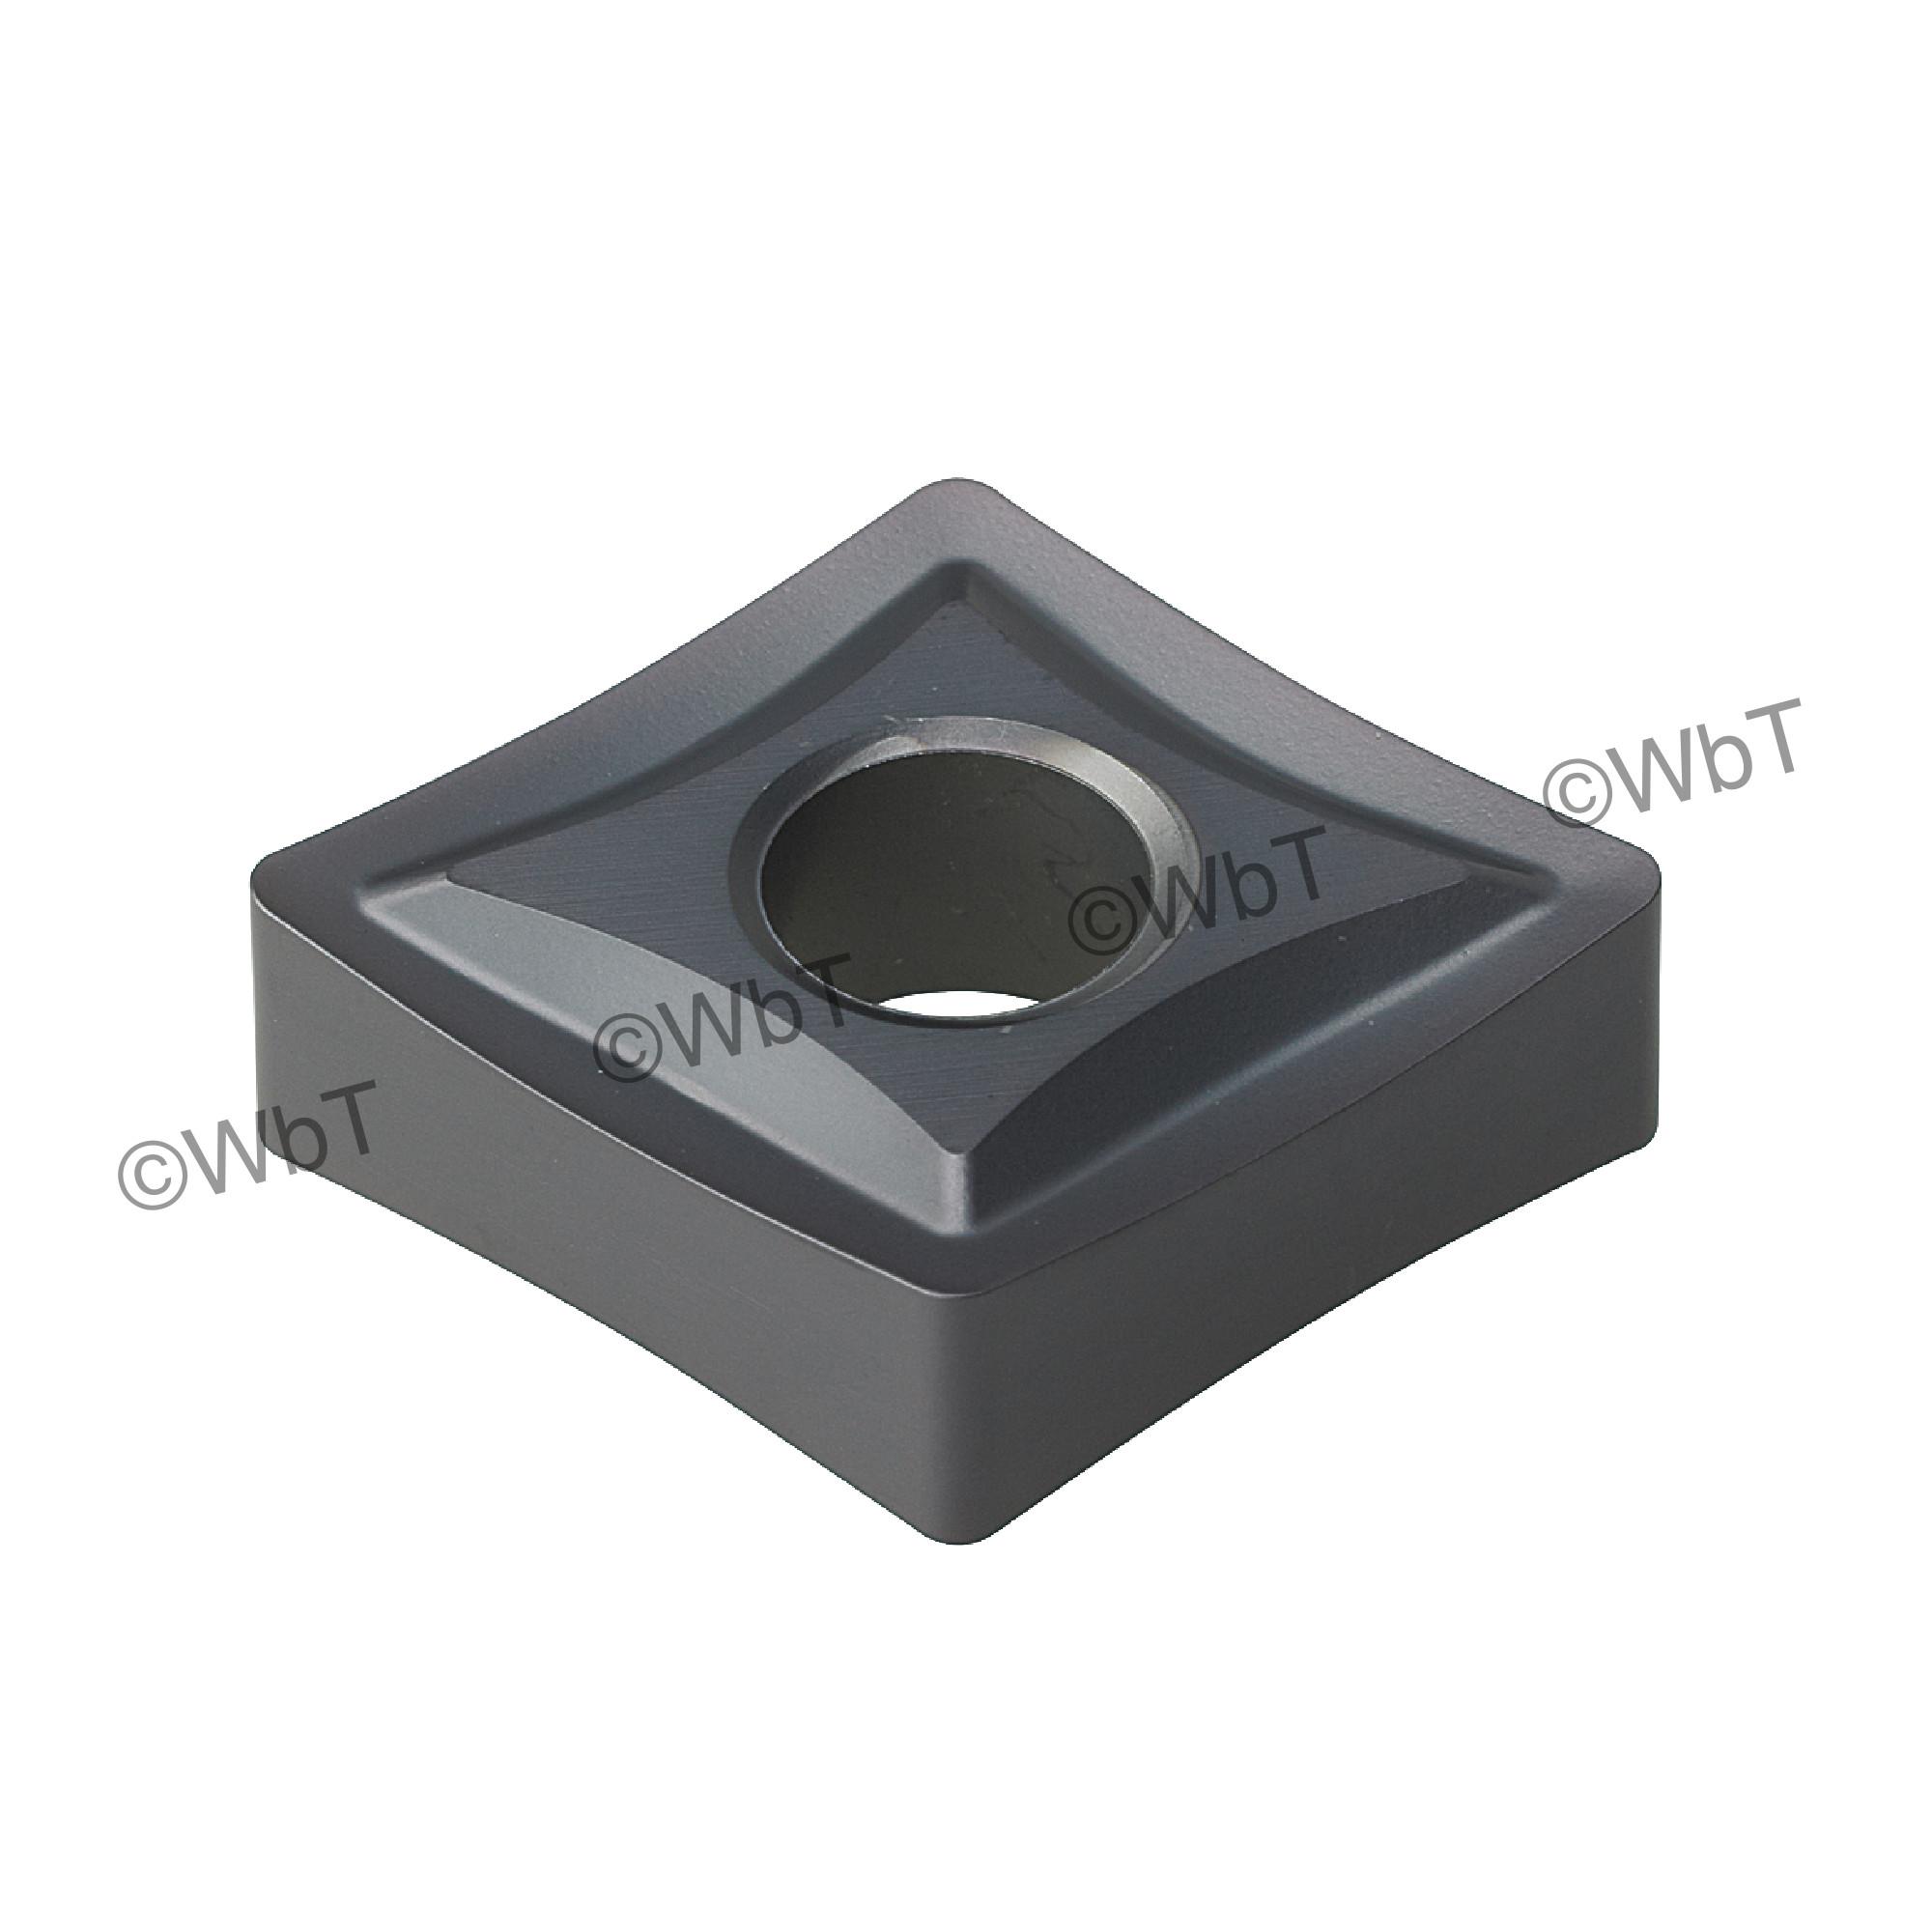 AKUMA - CNMG431-HPS1 PT10S - 80° Diamond / Indexable Carbide Turning Insert